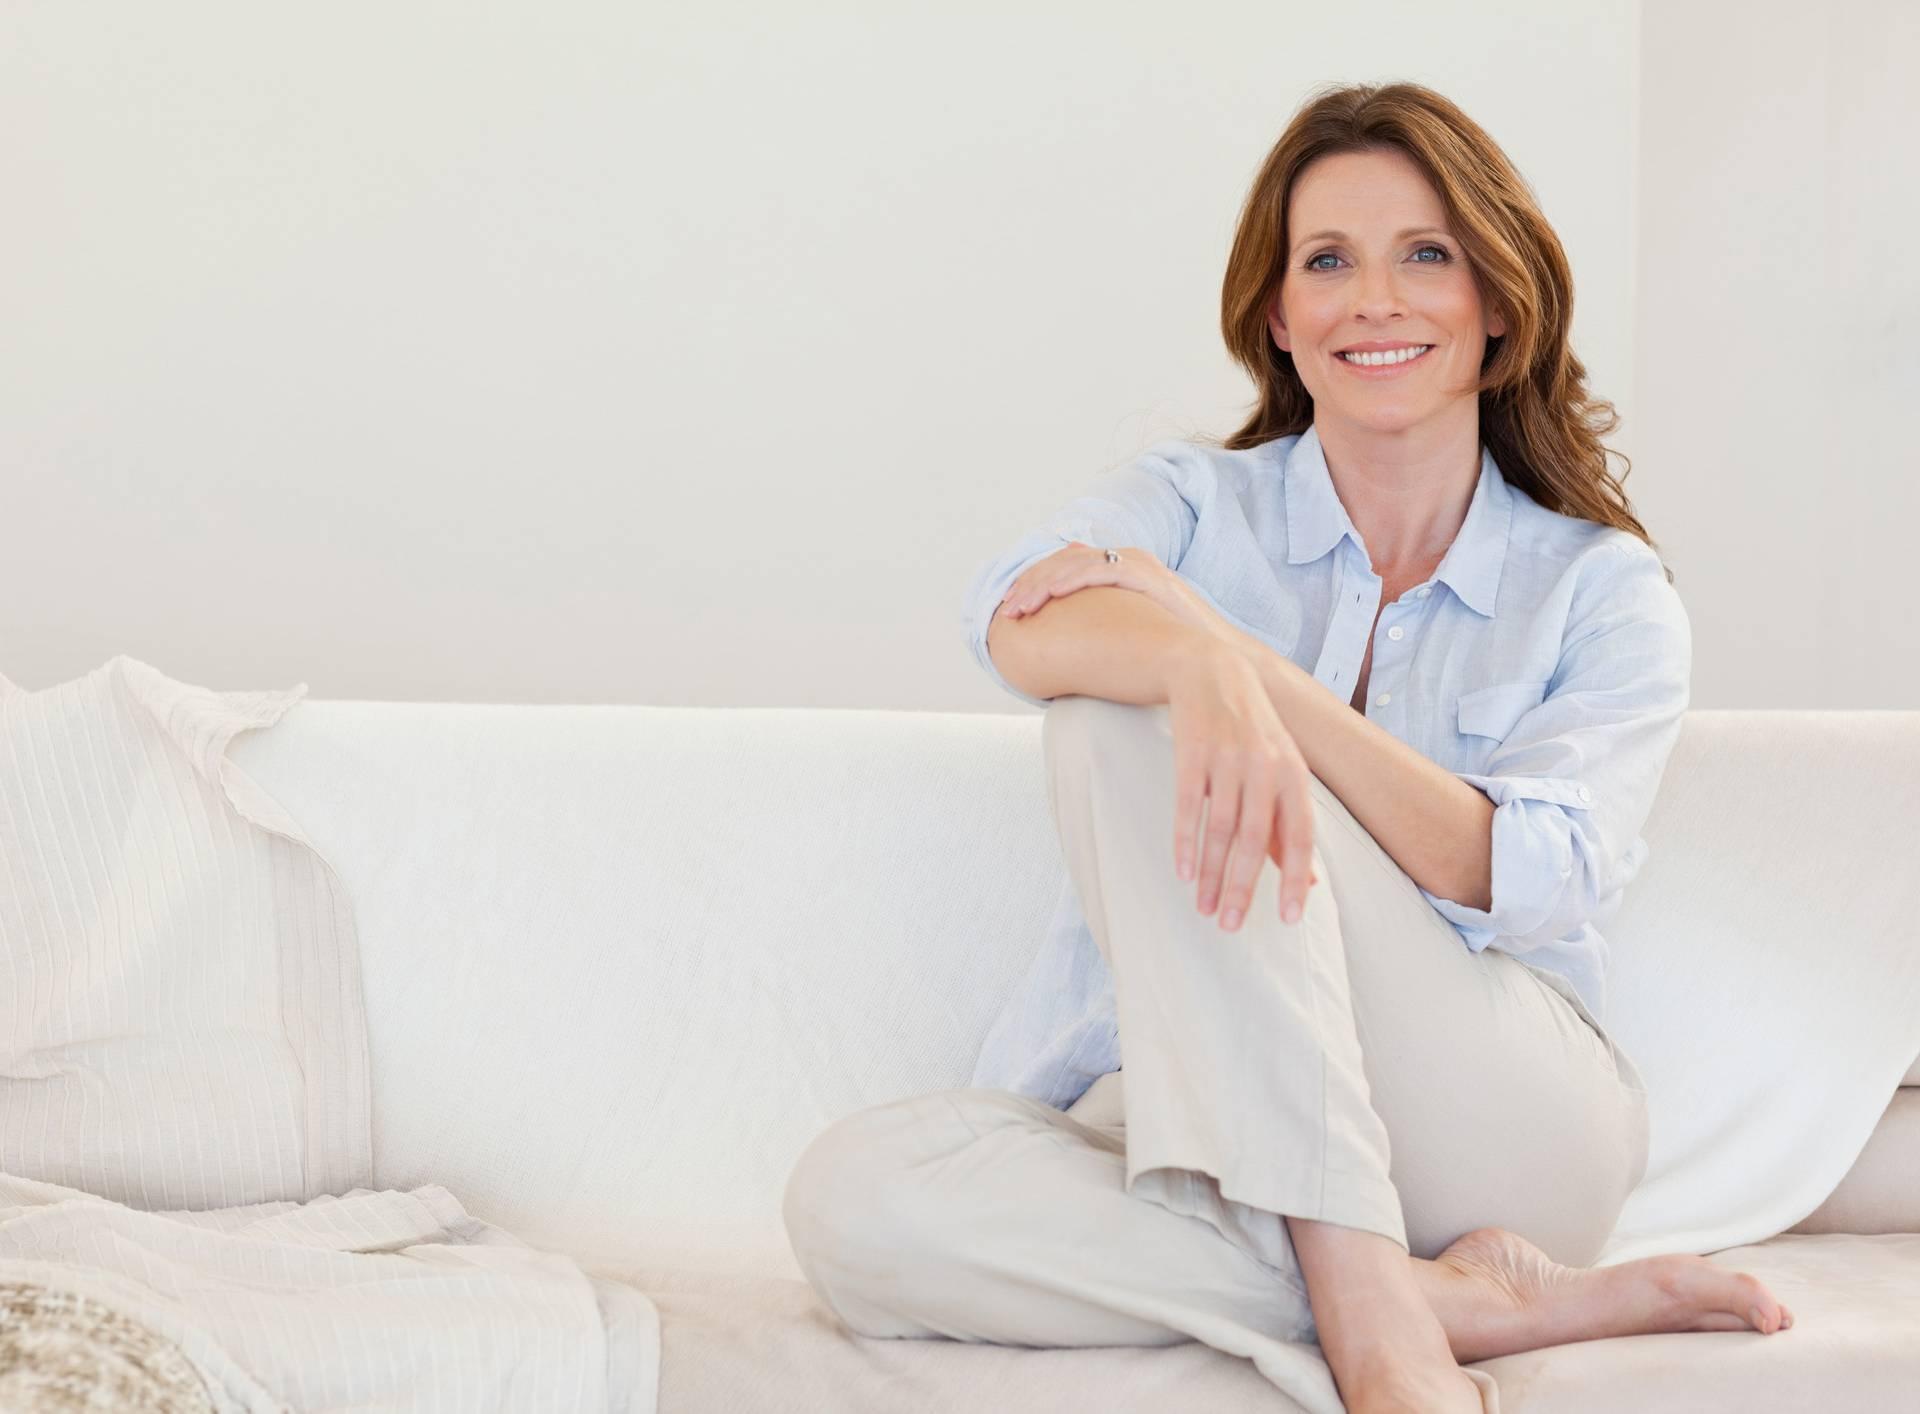 Bezbolno kroz menopauzu sa svjetskim preparatom br. 1